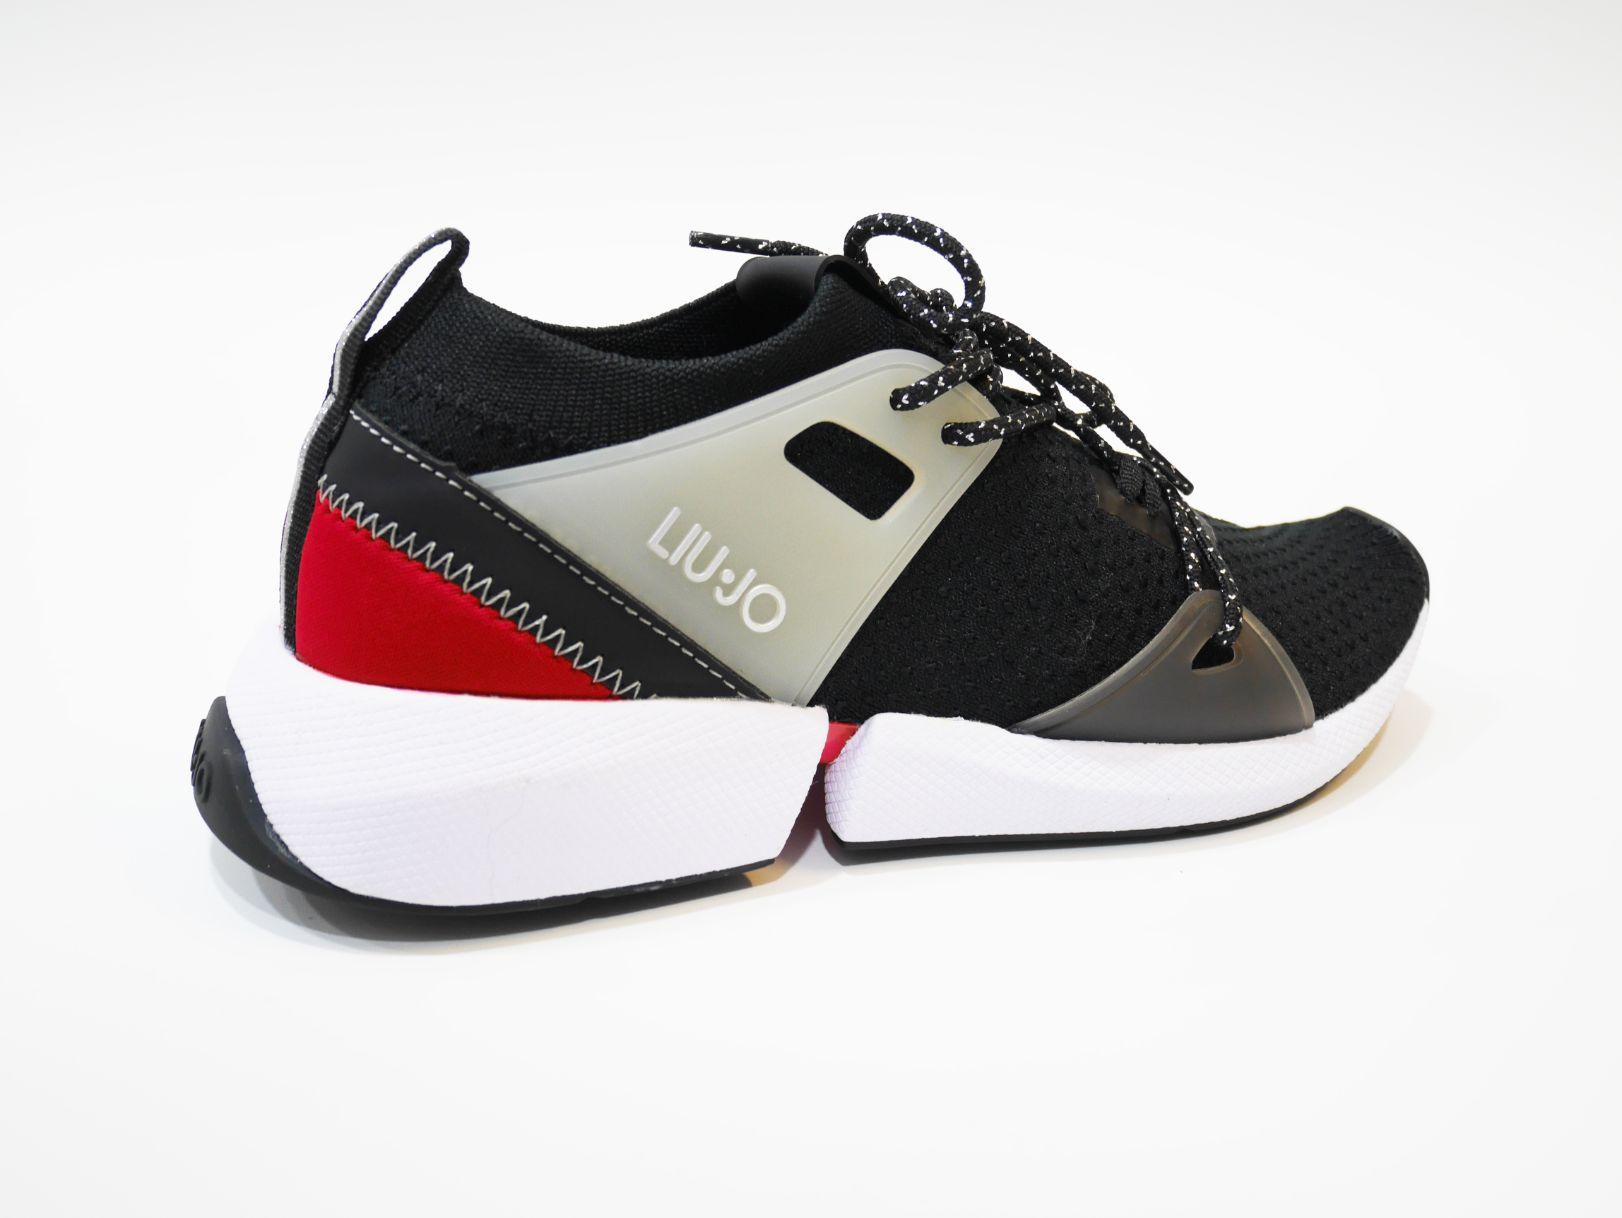 B69045 TX022 YULIA 01 SNEAKER BLACKRED 4